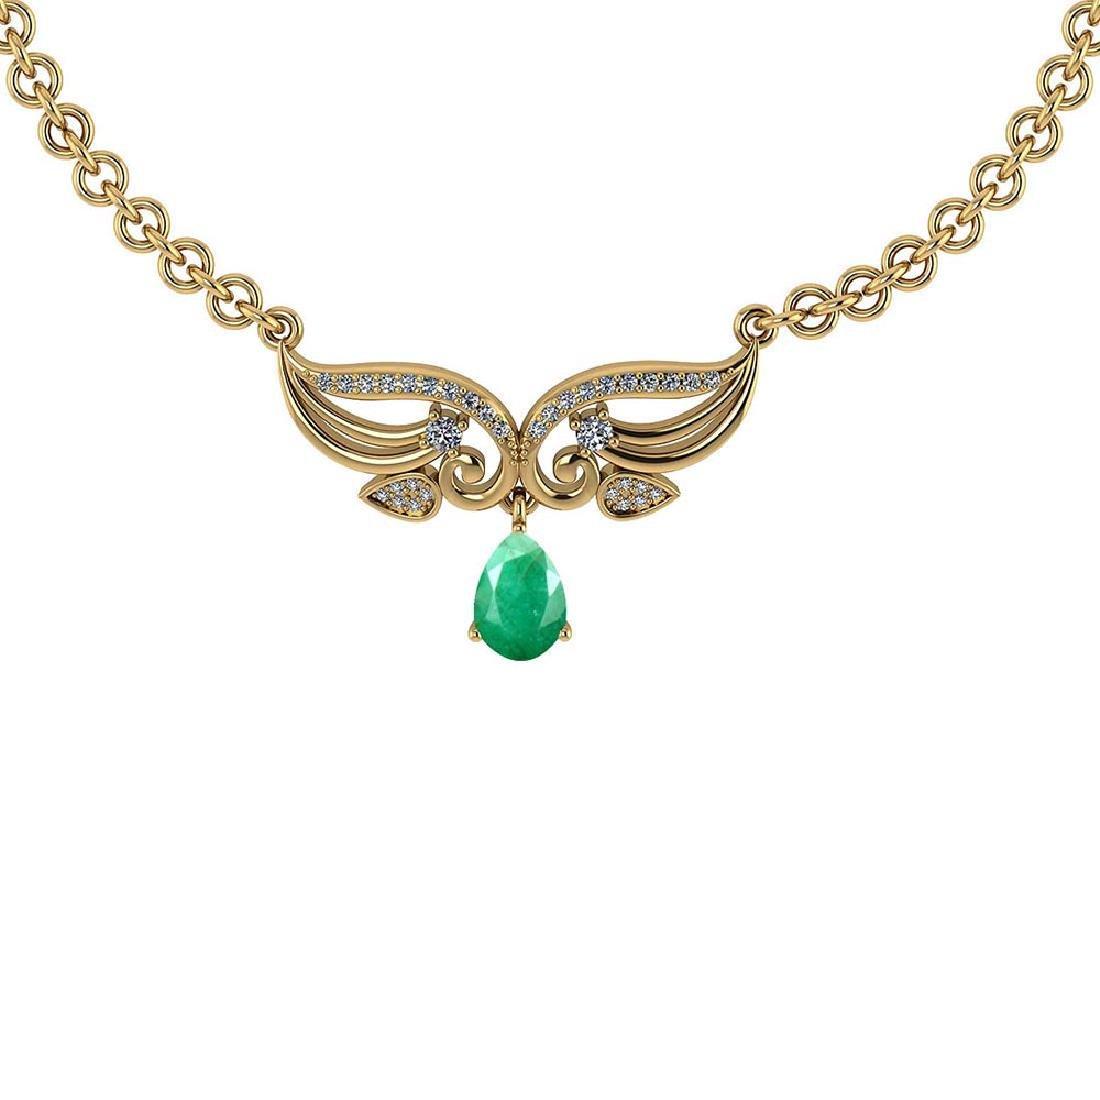 Certified 3.94 Ctw Genuine Emerald And Diamond 14k Yell